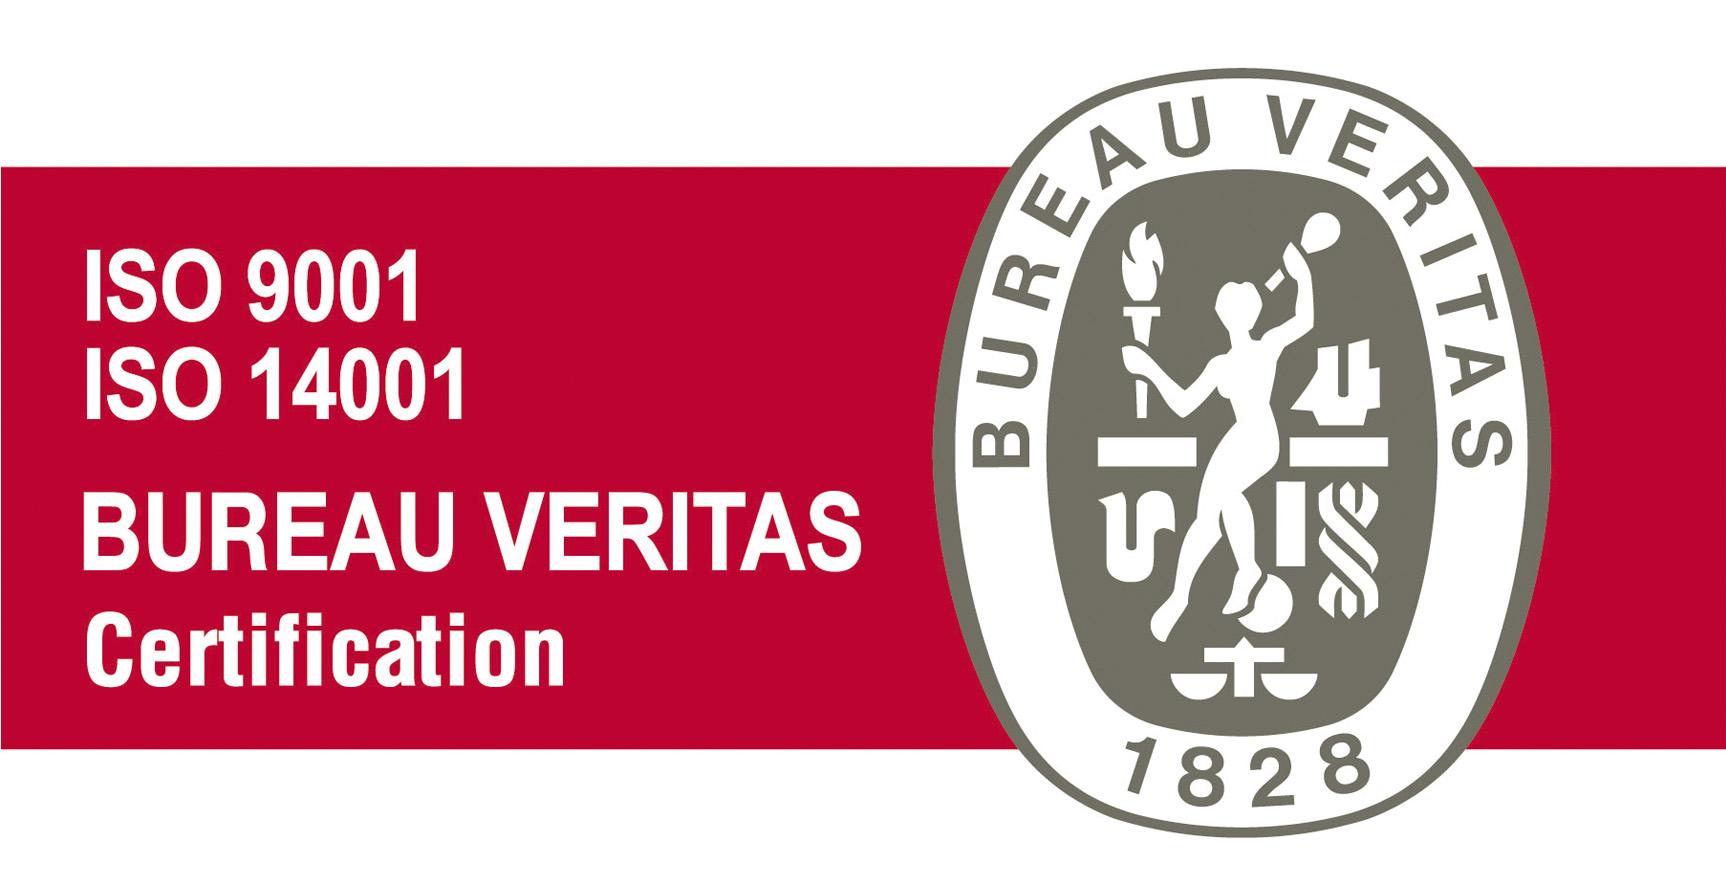 Logotipo ISO 9001 ISO 14001 Certificación